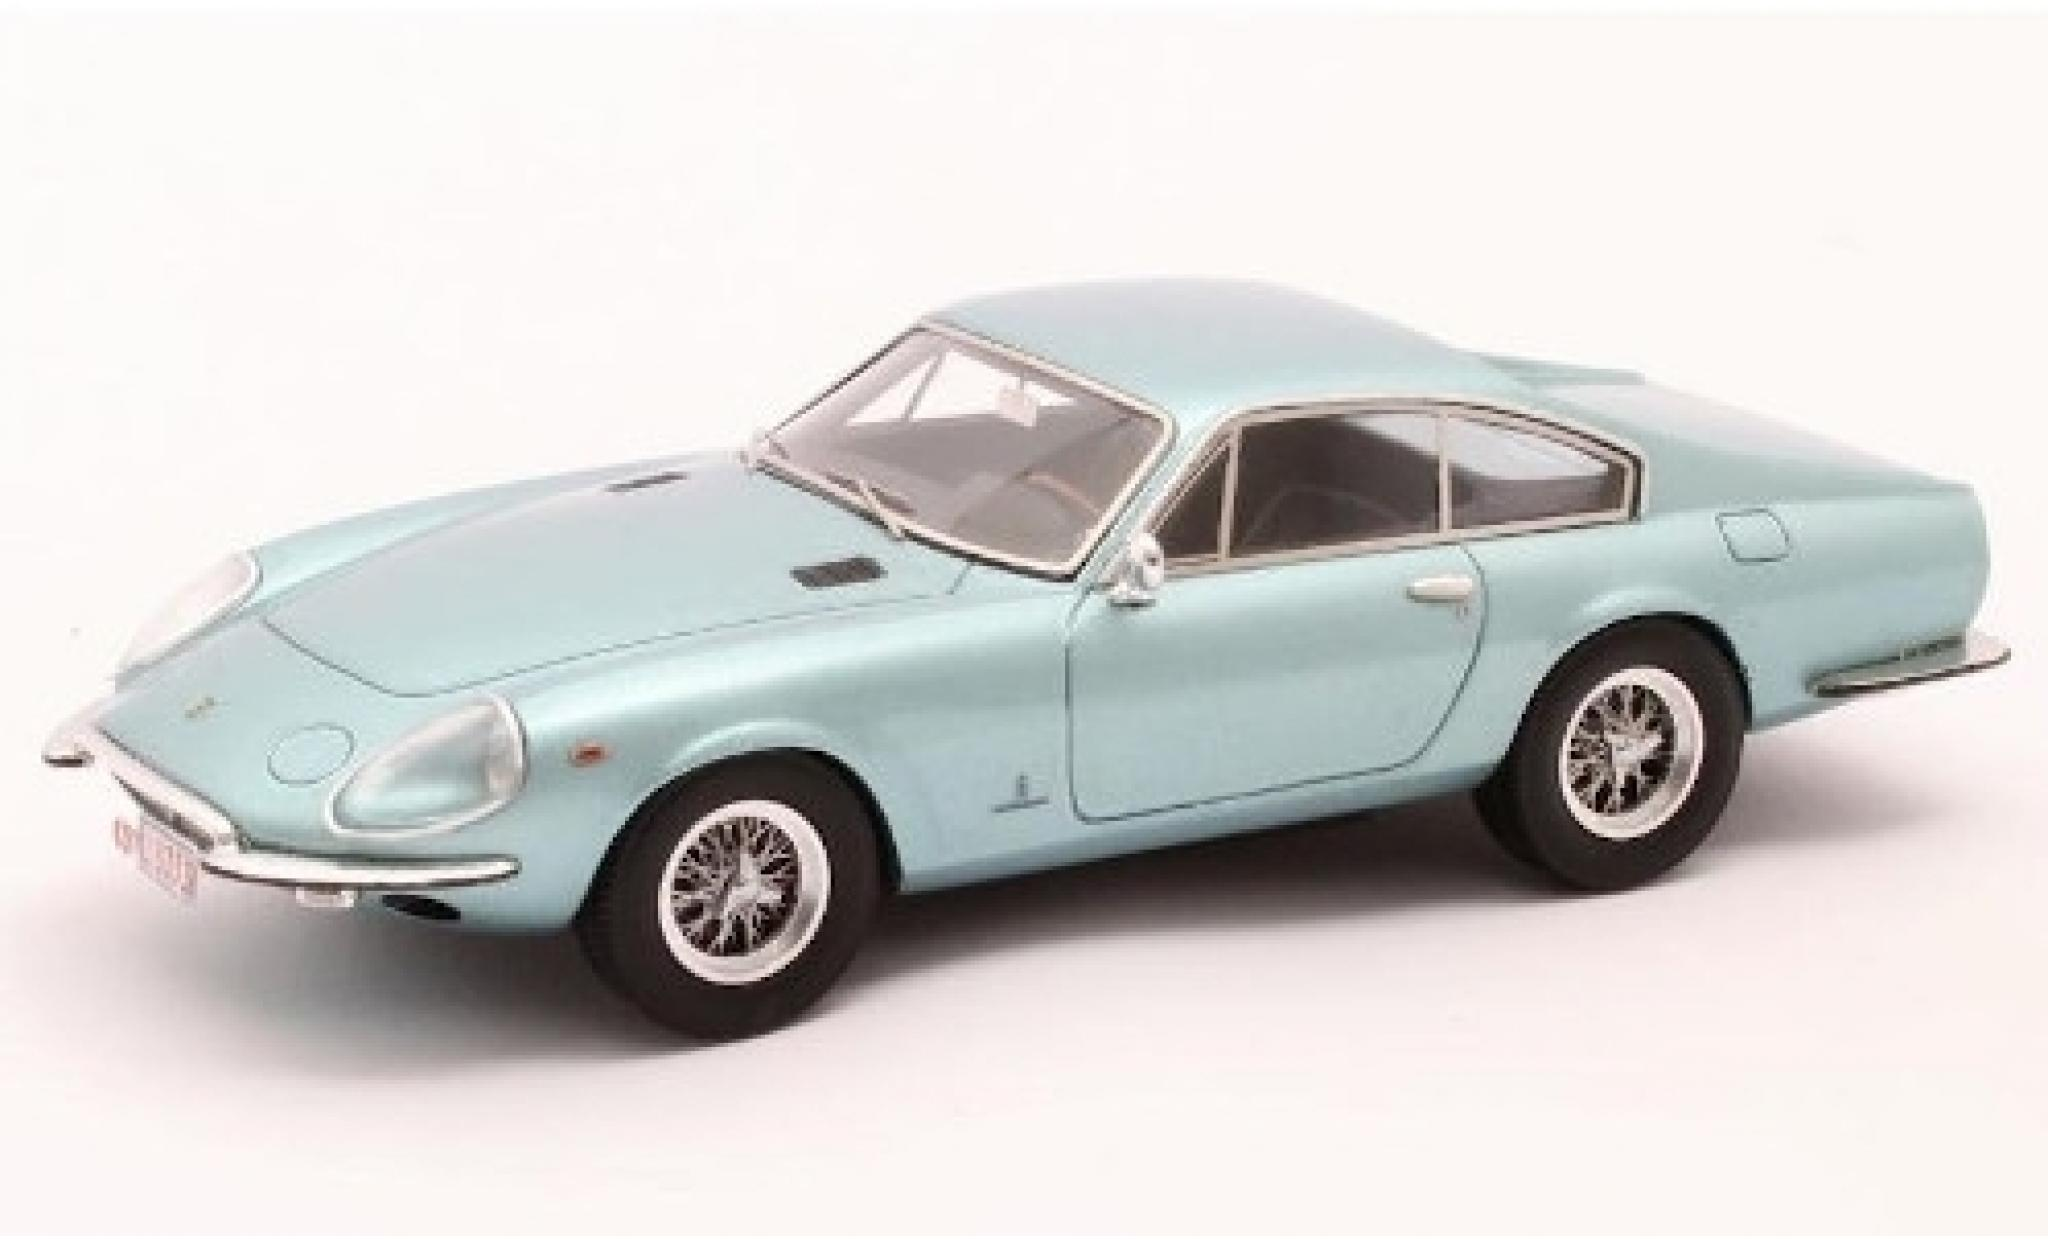 Ferrari 330 1/43 Matrix GTC Speciale Pininfarina metallise bleue 1967 Fahrgestell-Nr. 09439 - Prinzessin Liliane de Réthy